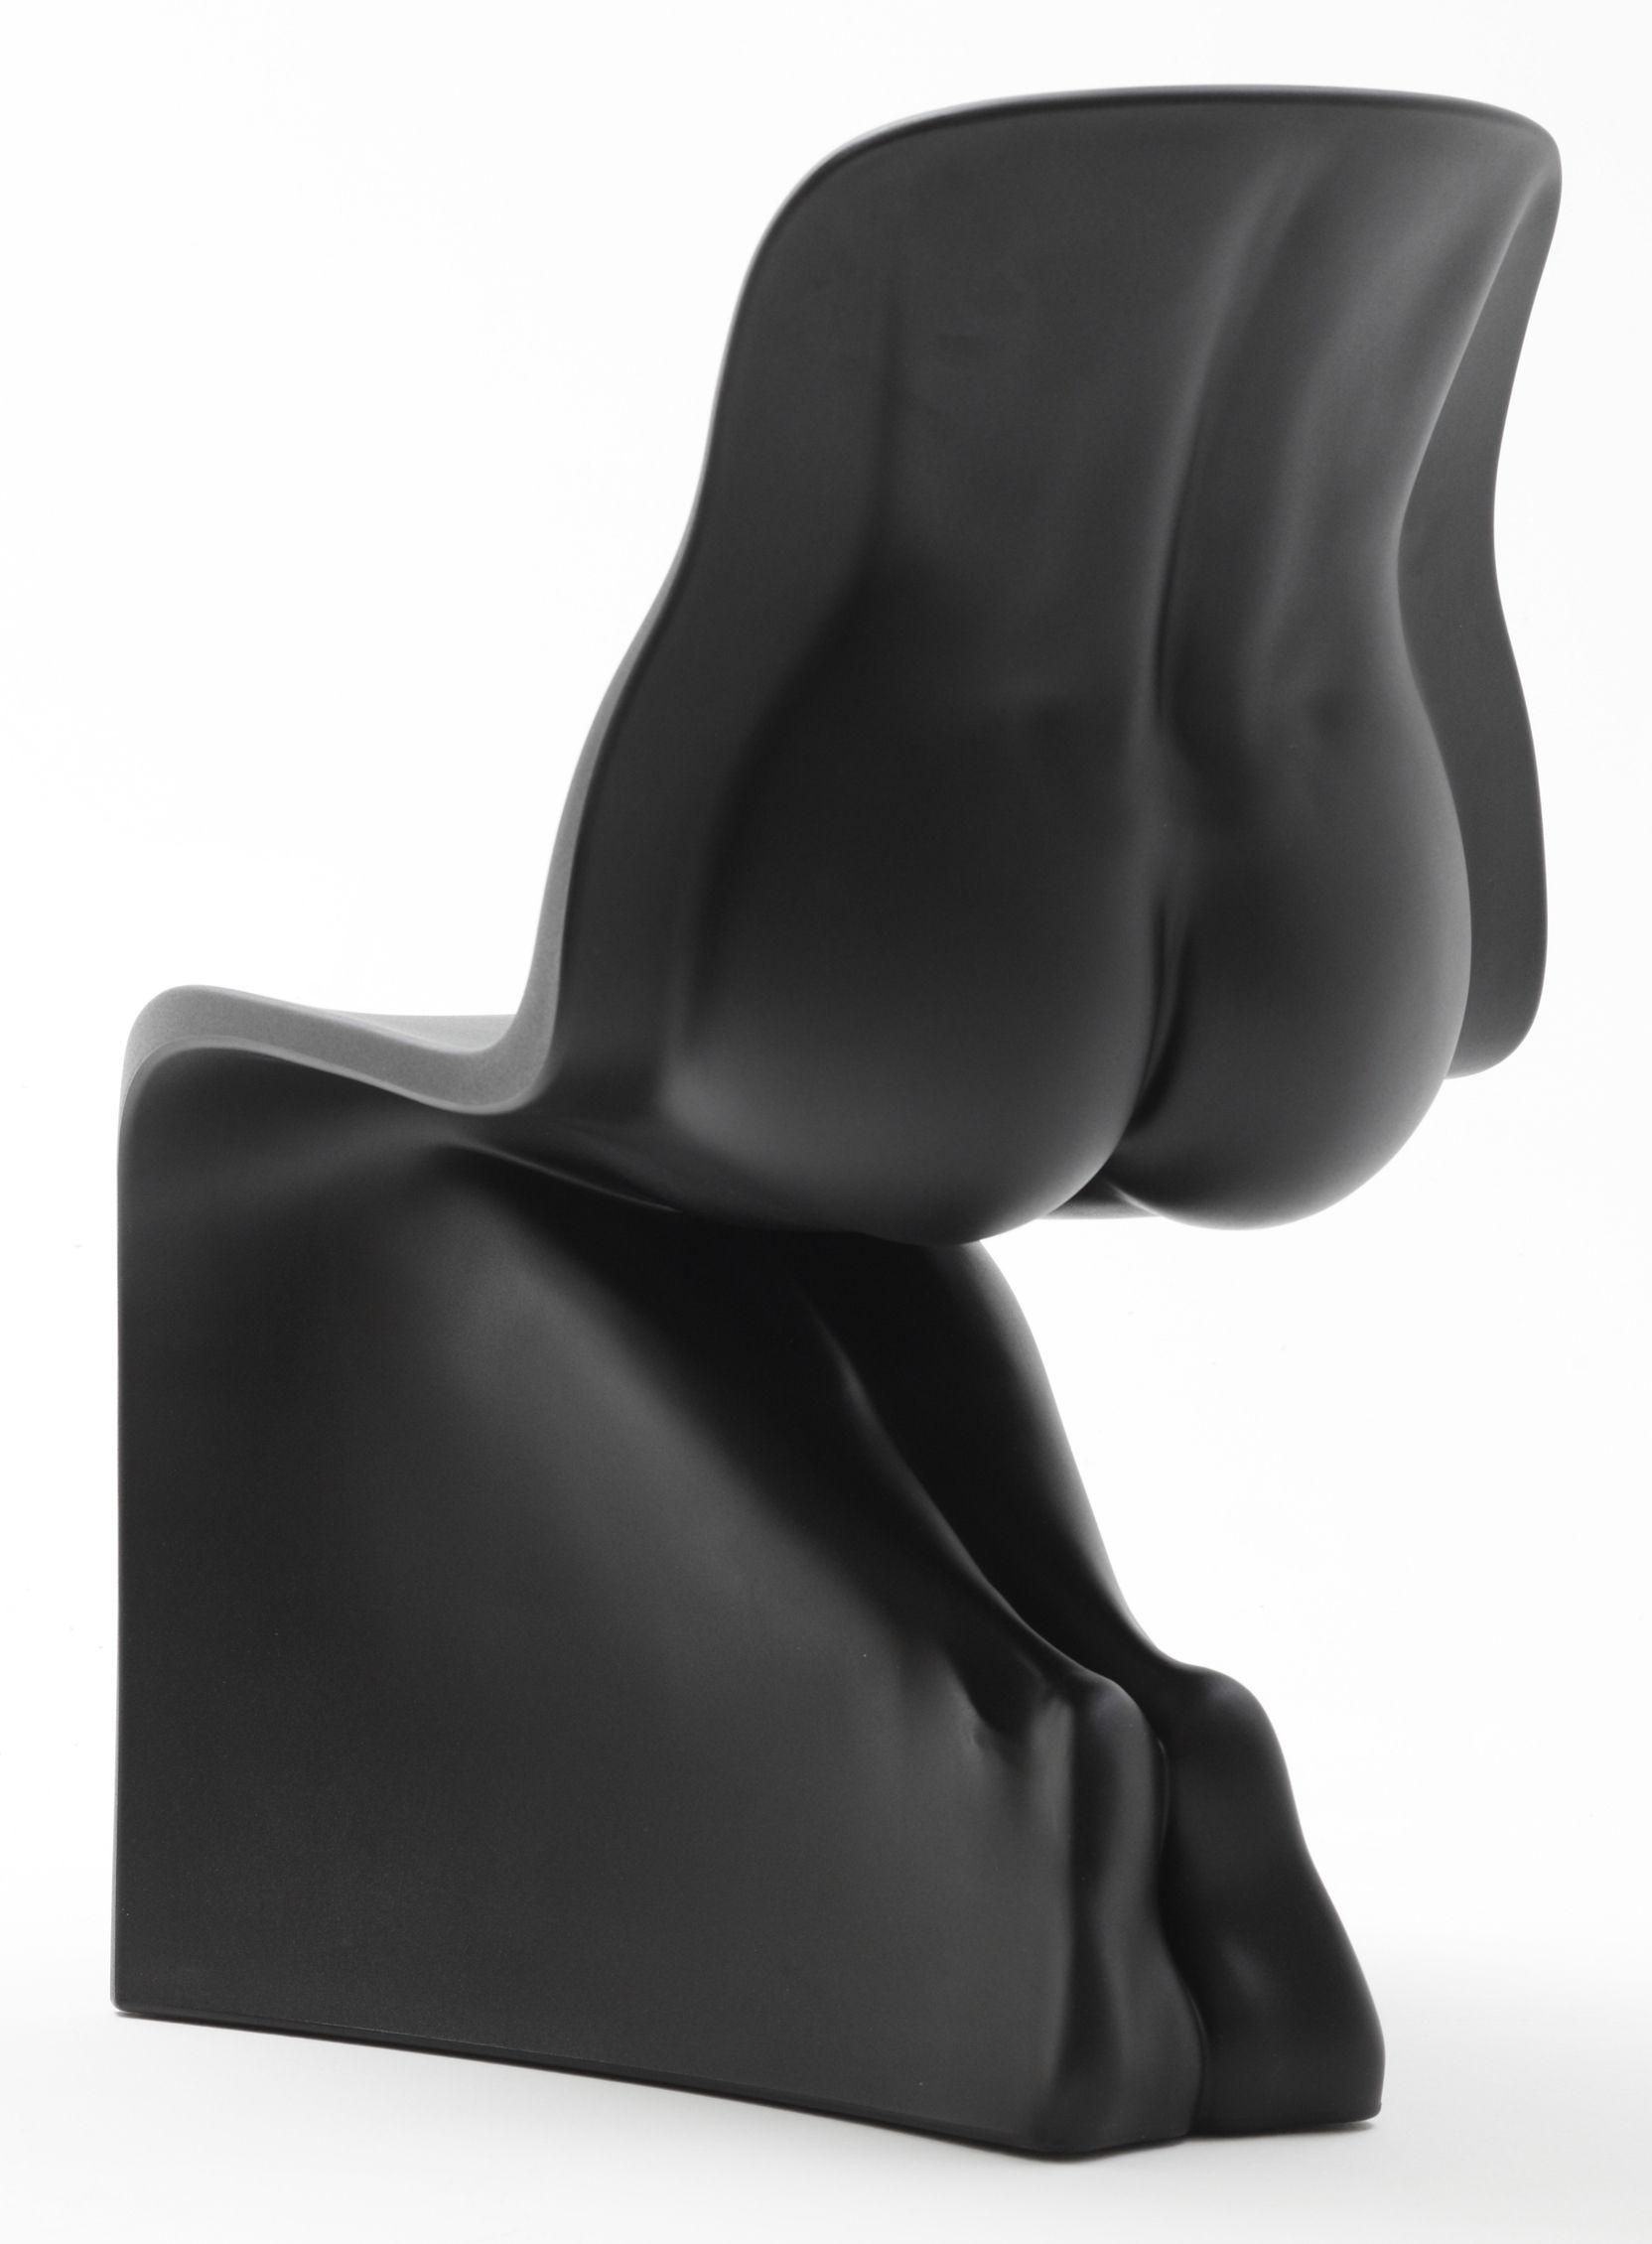 Möbel - Stühle  - Her Stuhl - Casamania - Schwarz - Polyäthylen